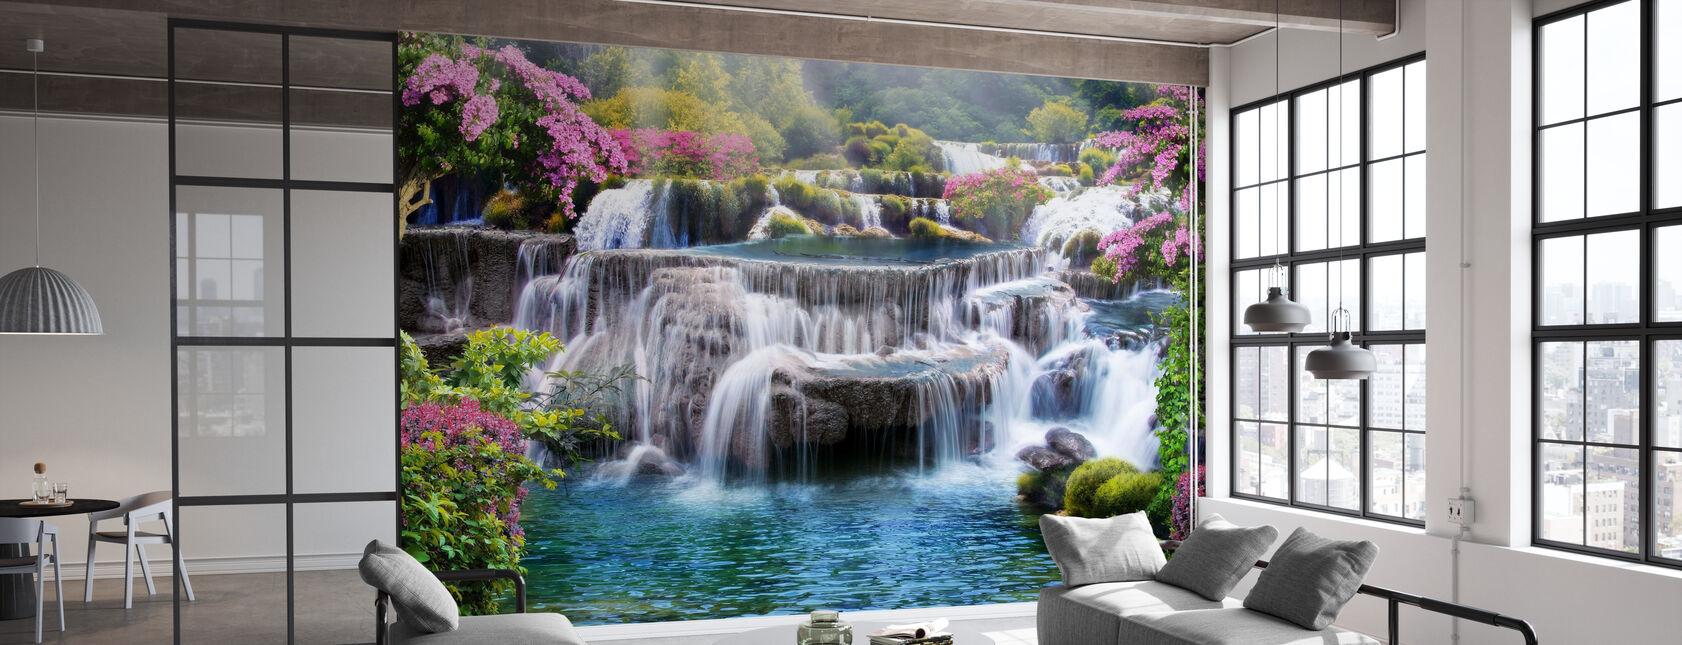 Tropical Waterfall - Wallpaper - Office